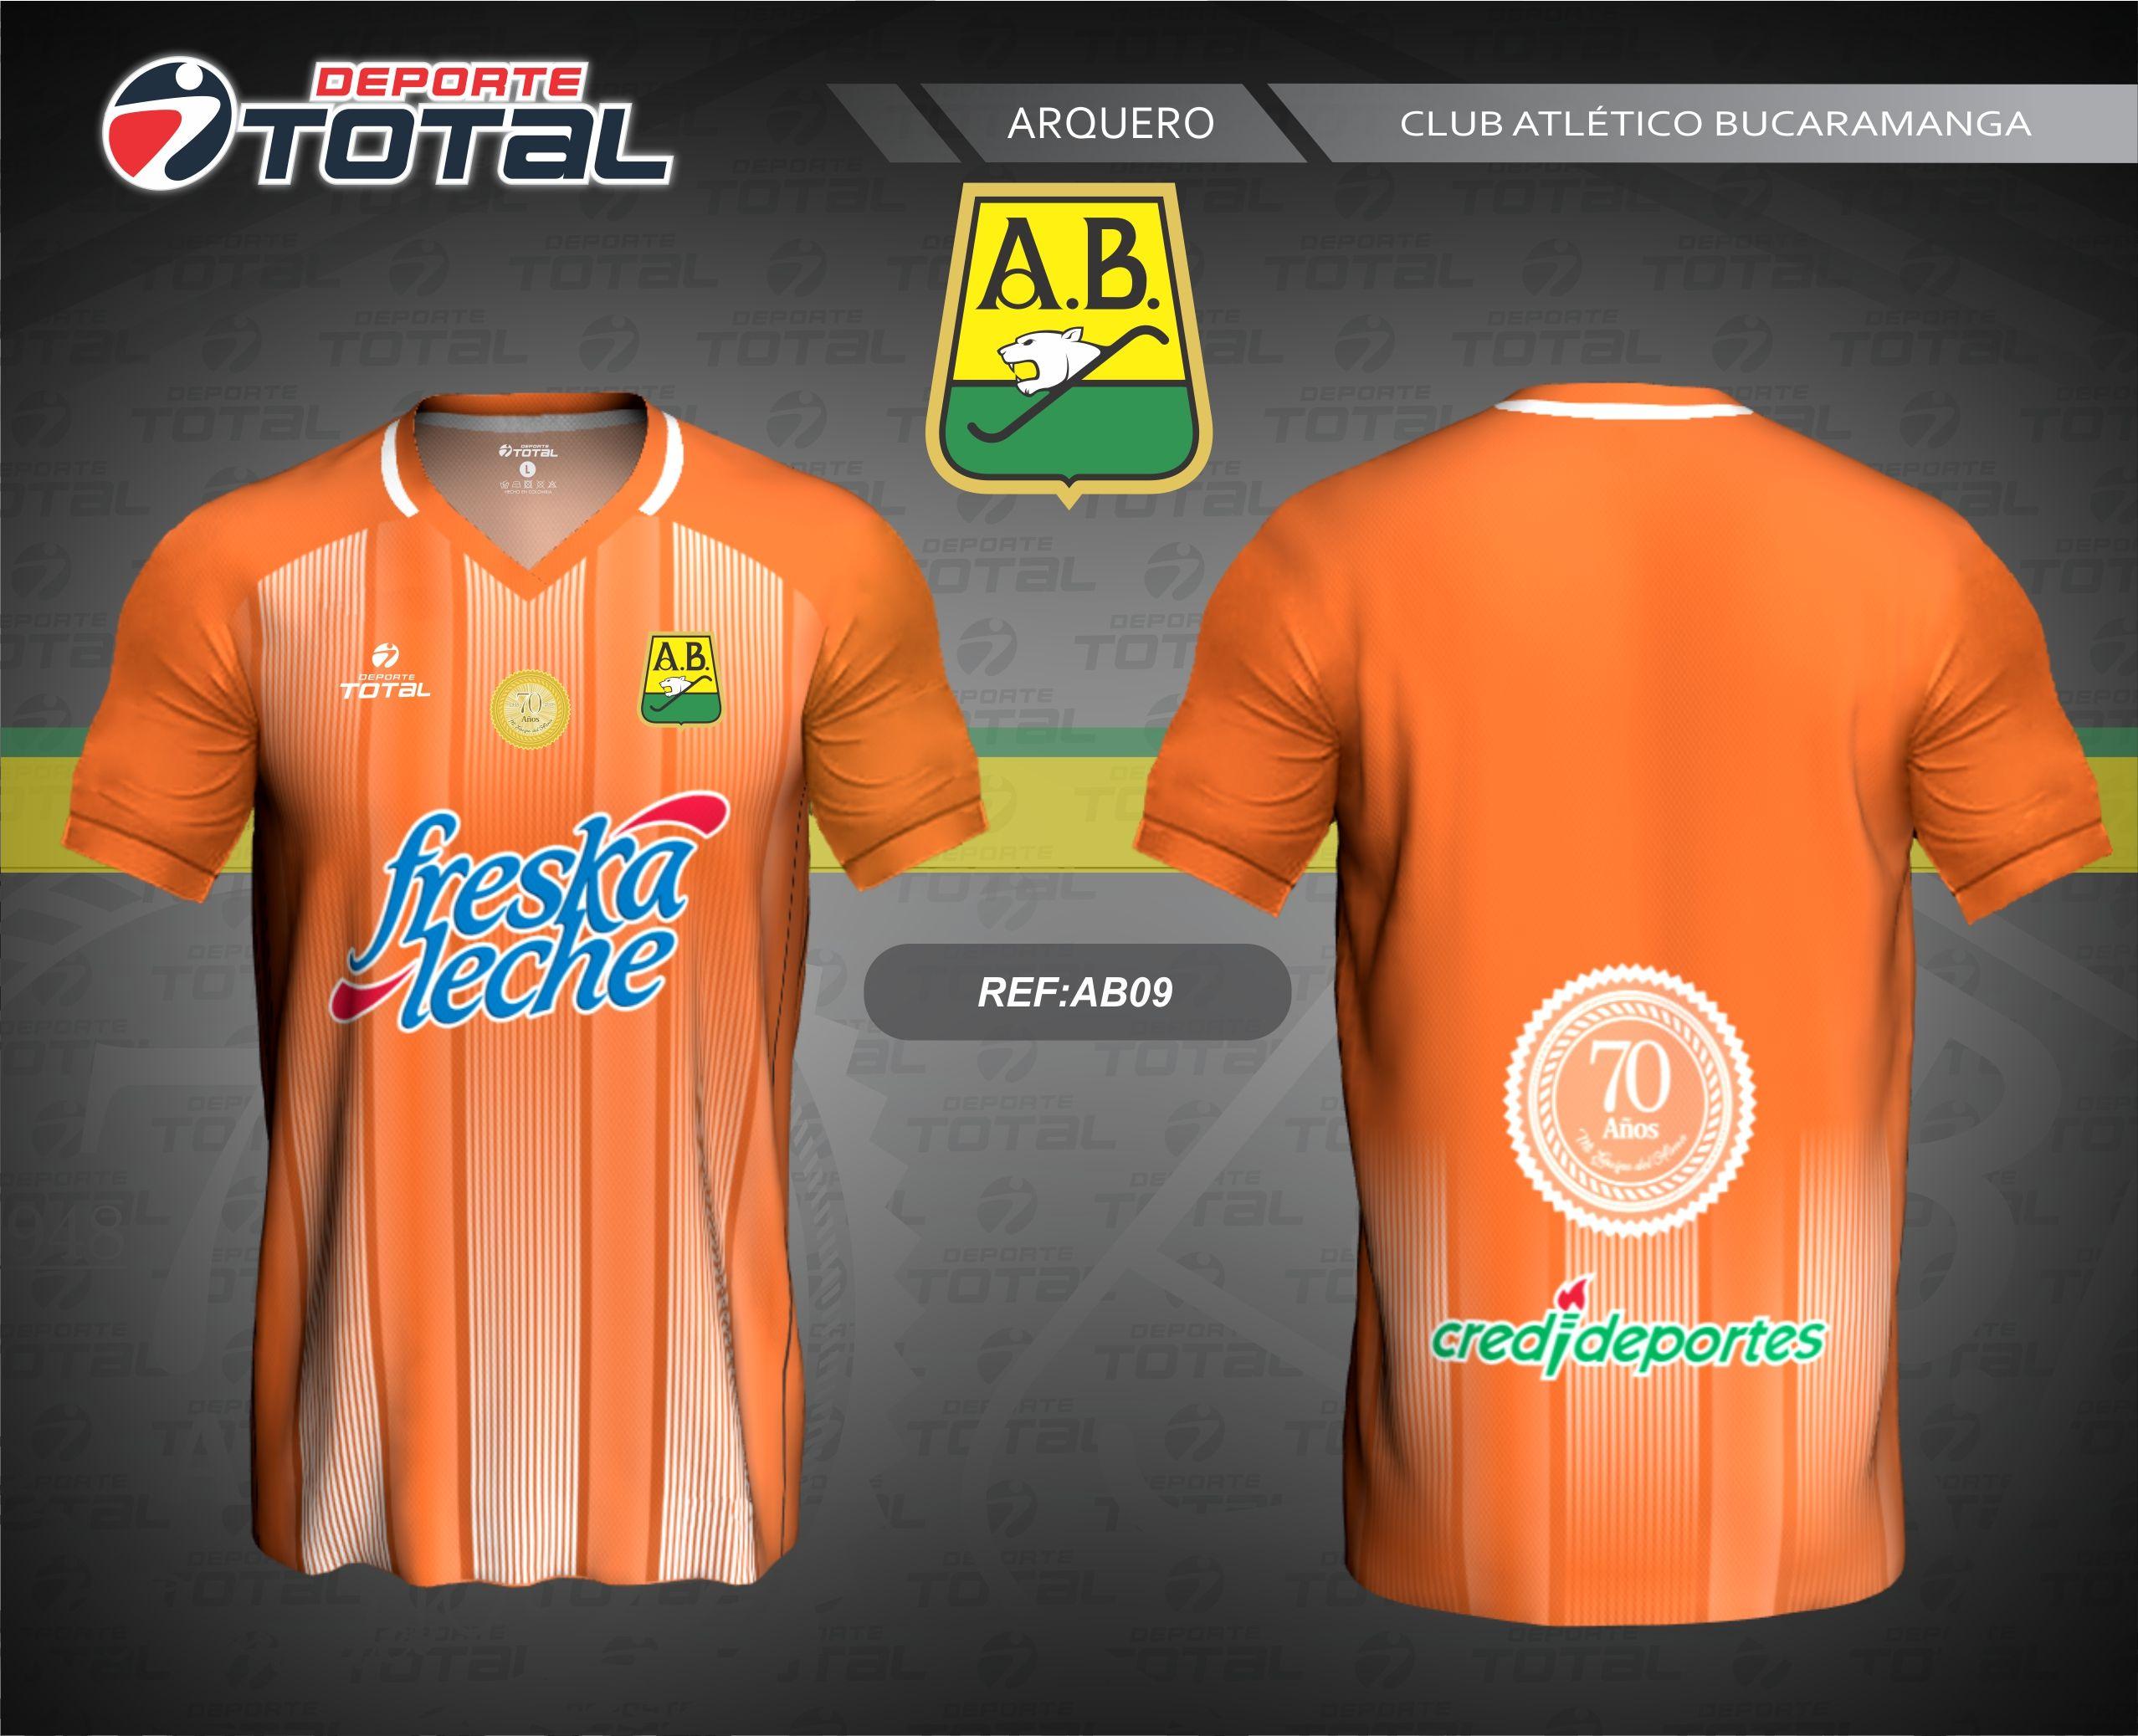 Camiseta de Arquero - deporte total-atletico bucaramanga- 2018-camiseta -uniforme- 9b7e9b01f9dcd